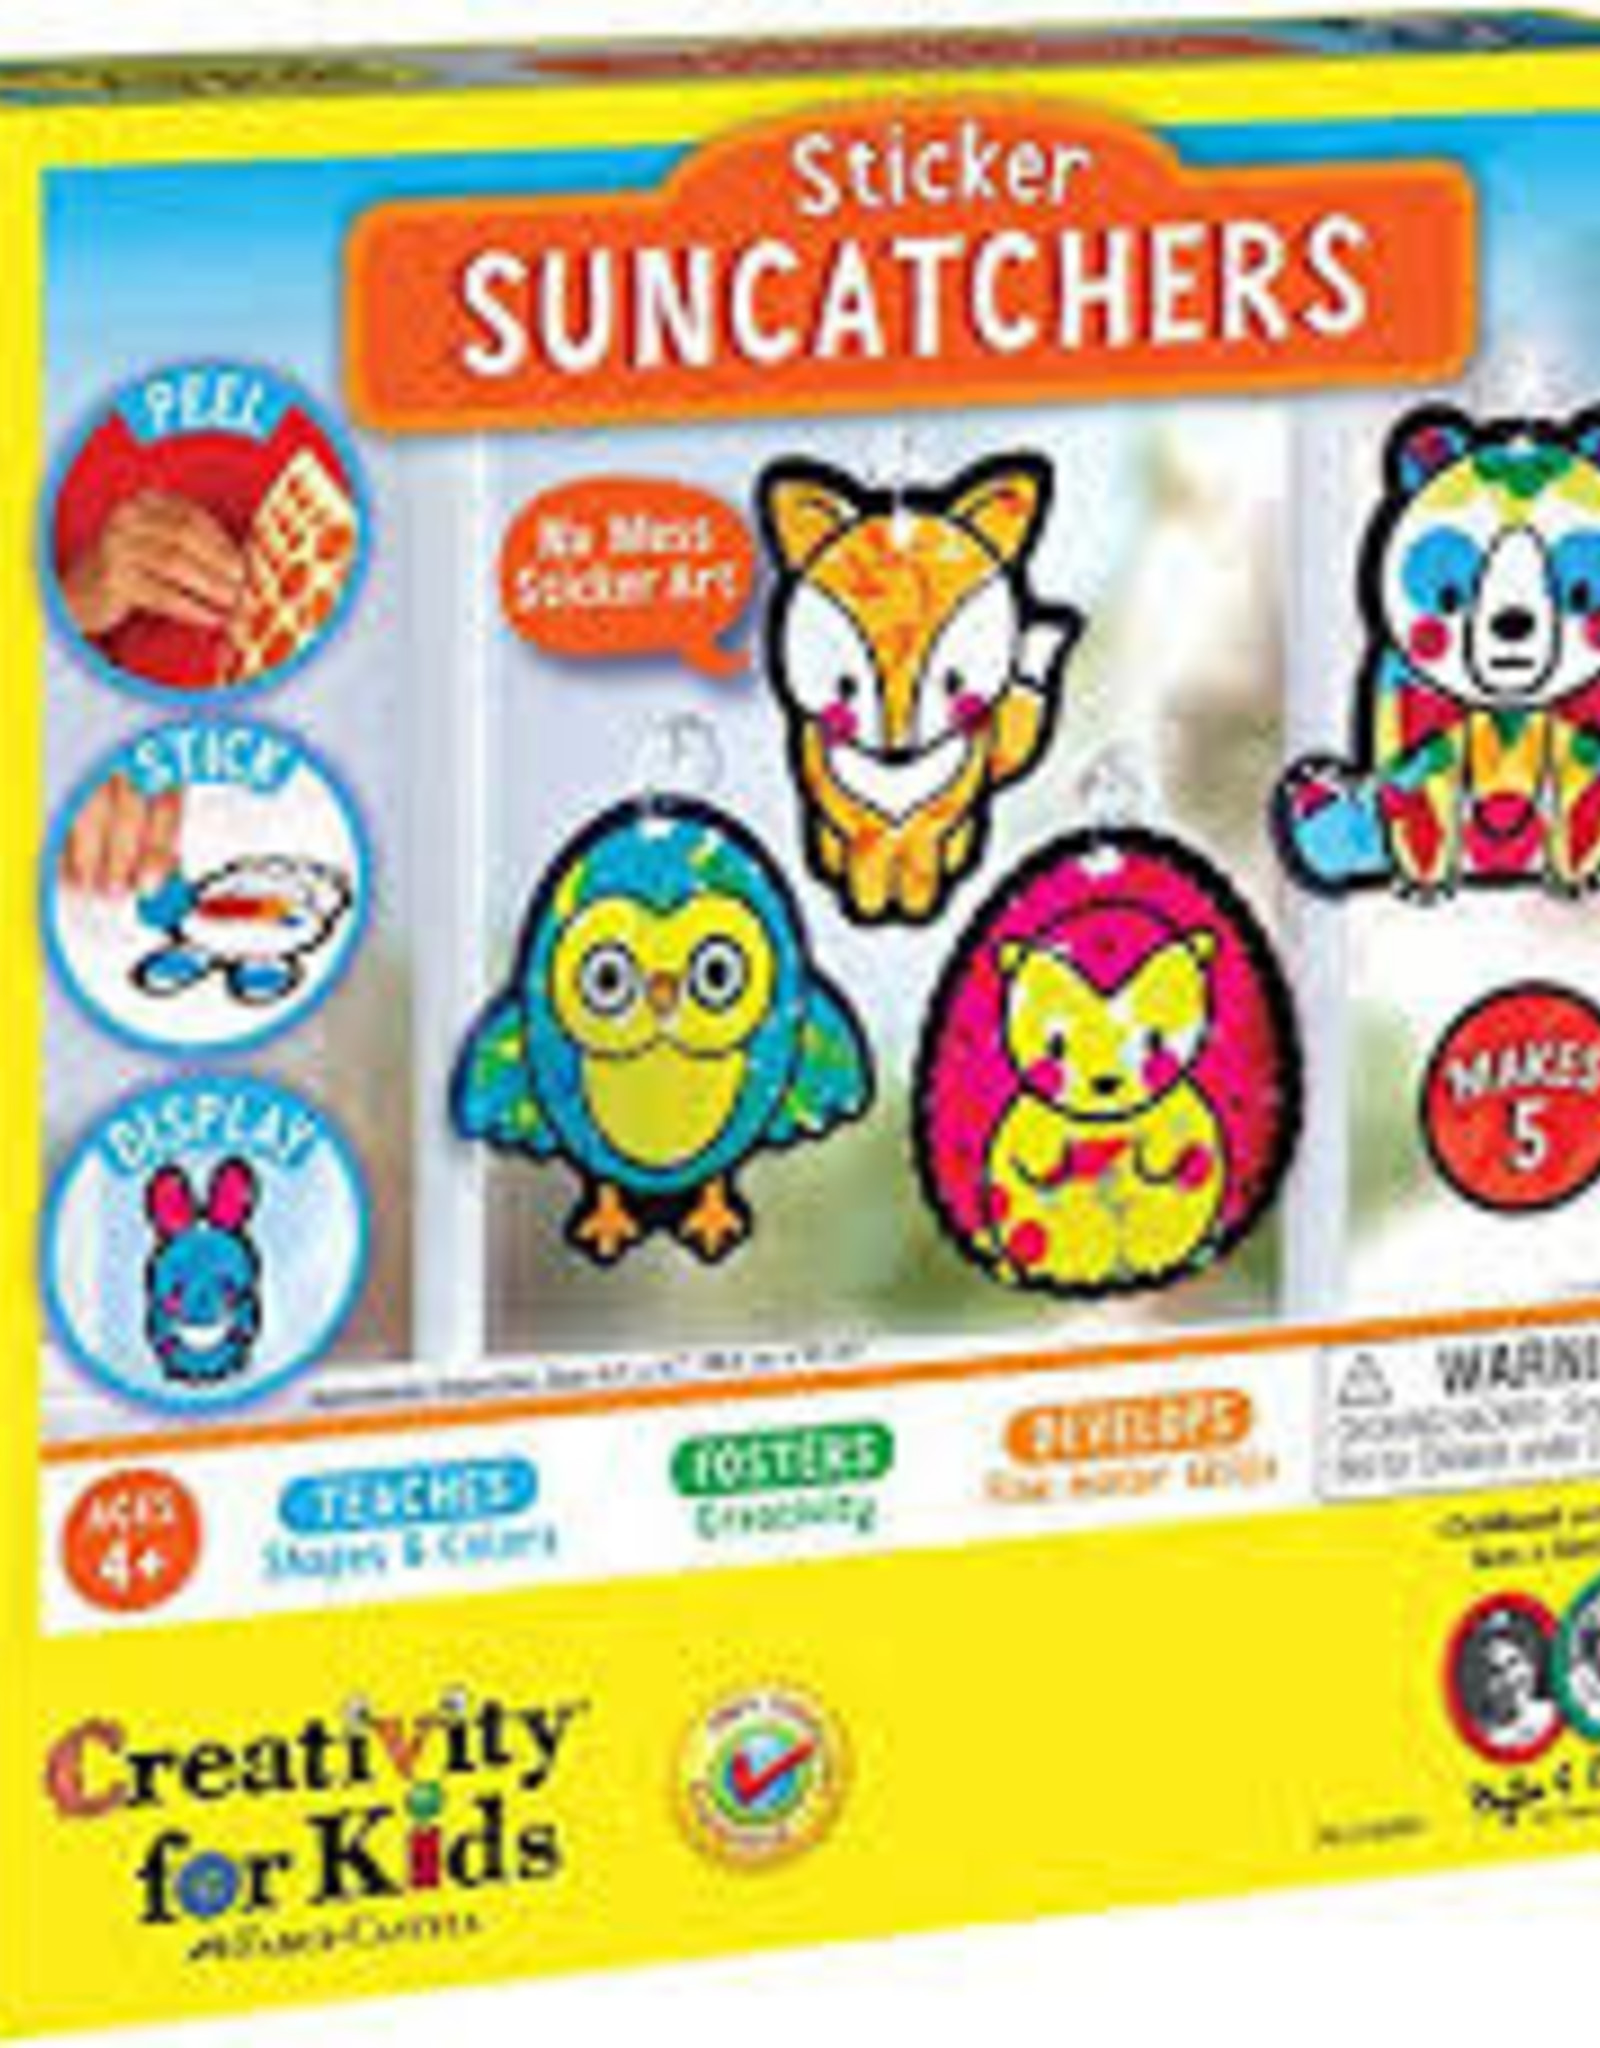 Creativity For Kids Sticker Suncatchers